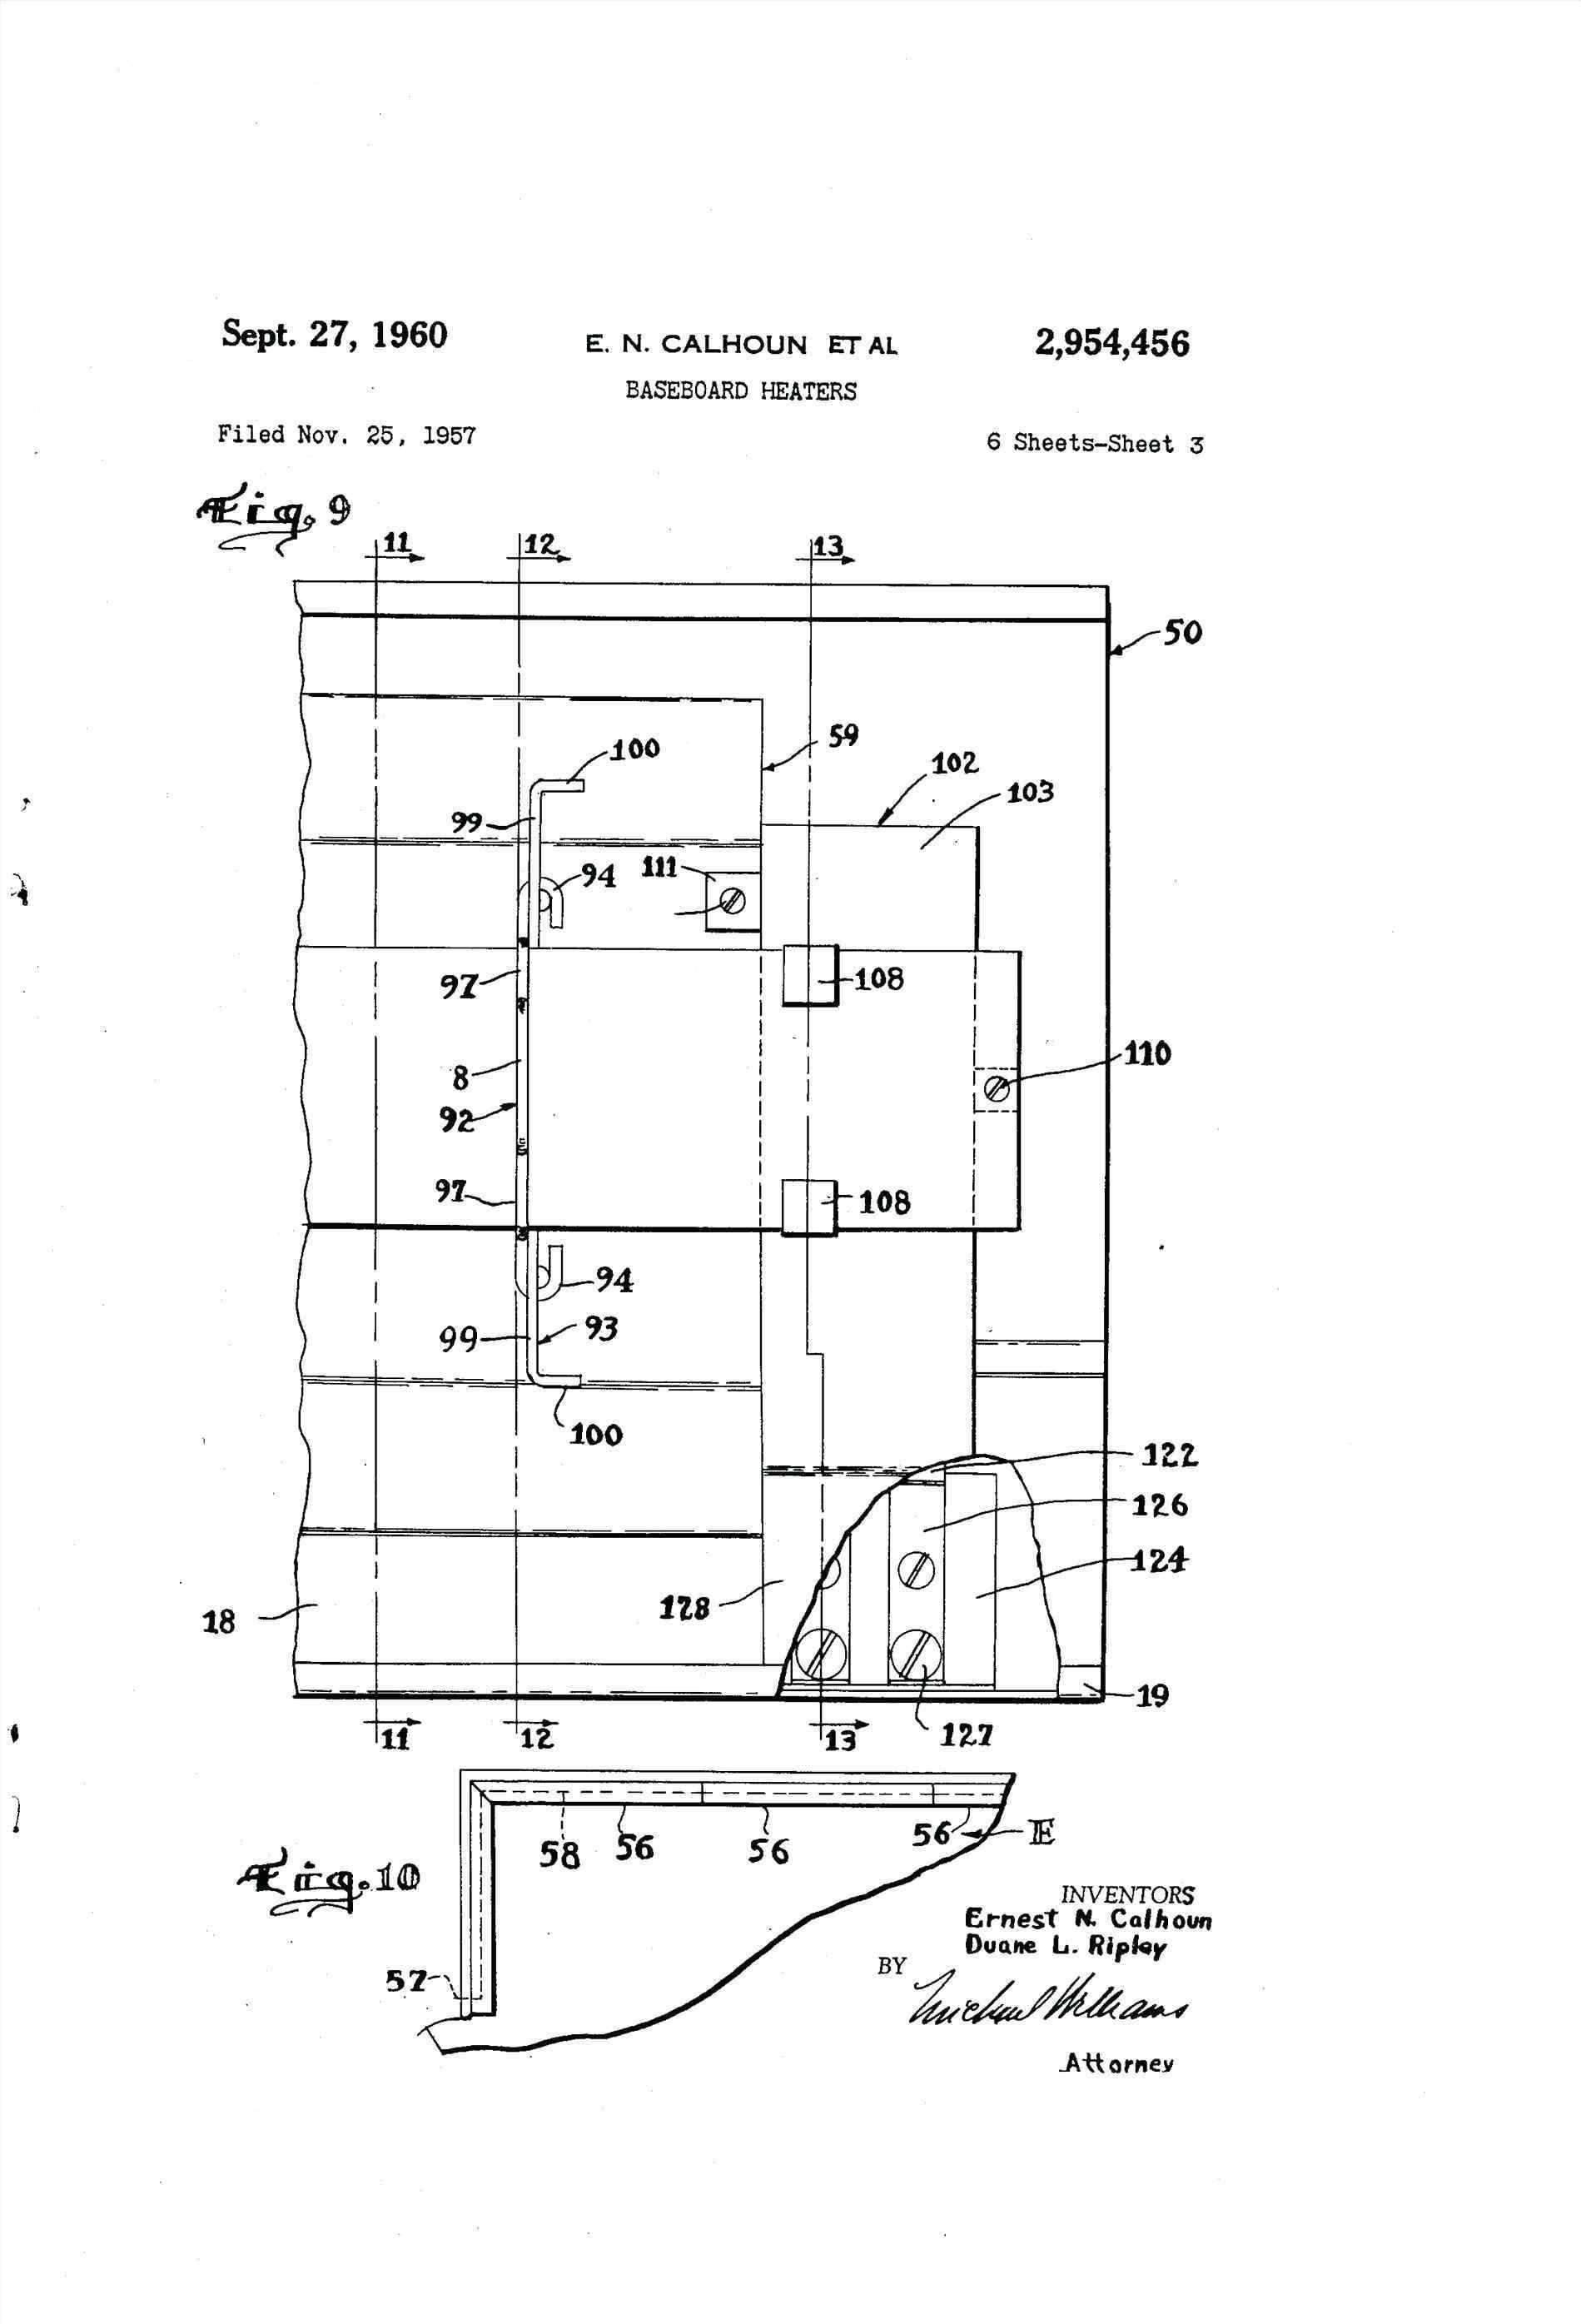 Fahrenheat Baseboard Heater Wiring Diagram - fahrenheat ... on